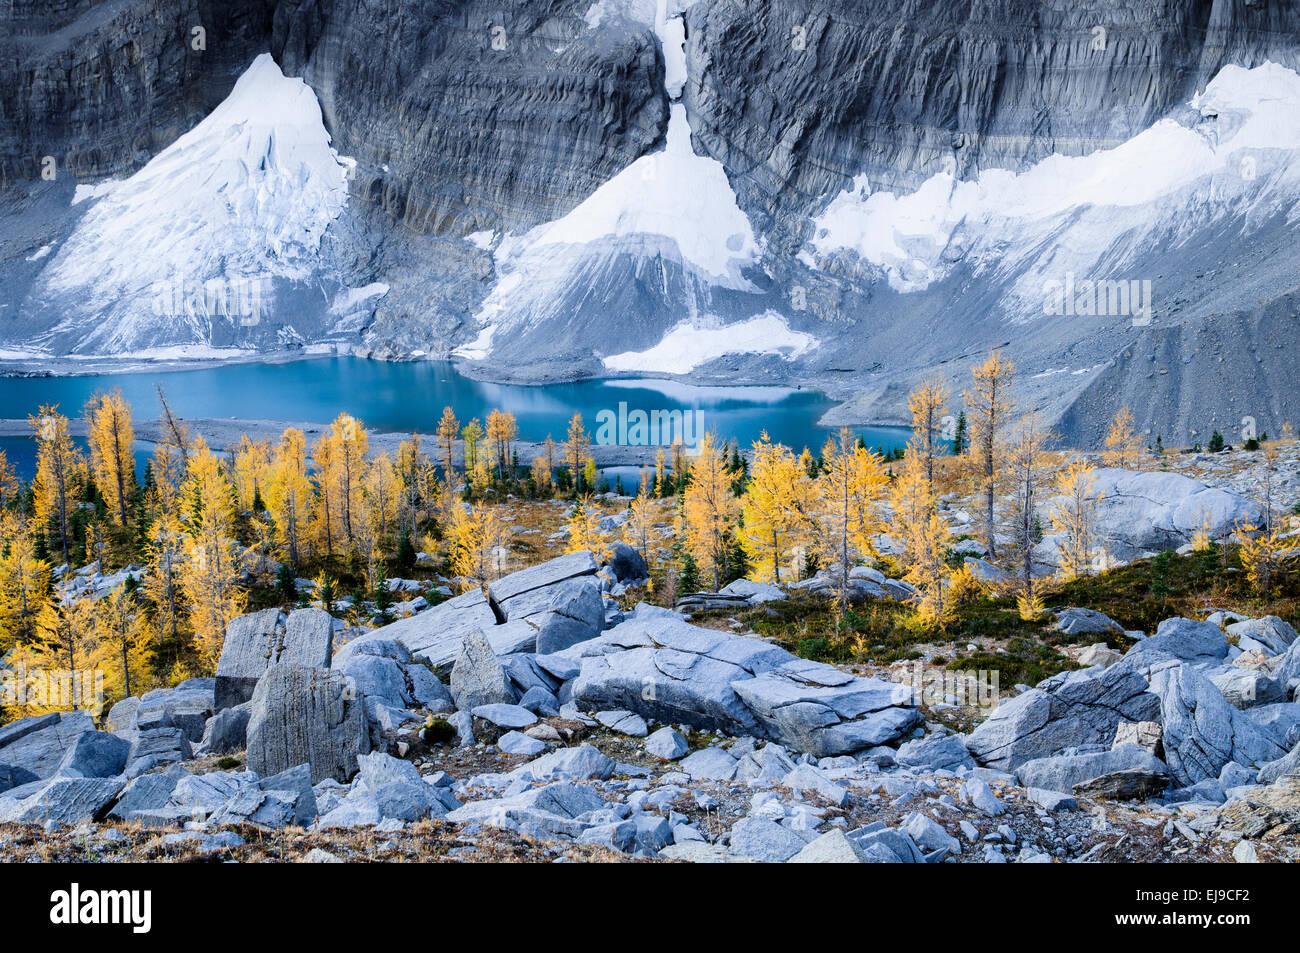 Lärche im leuchtenden Gelb Herbst Farben, Rockwall Floe See, Kootenay National Park, Britisch-Kolumbien, Kanada Stockbild